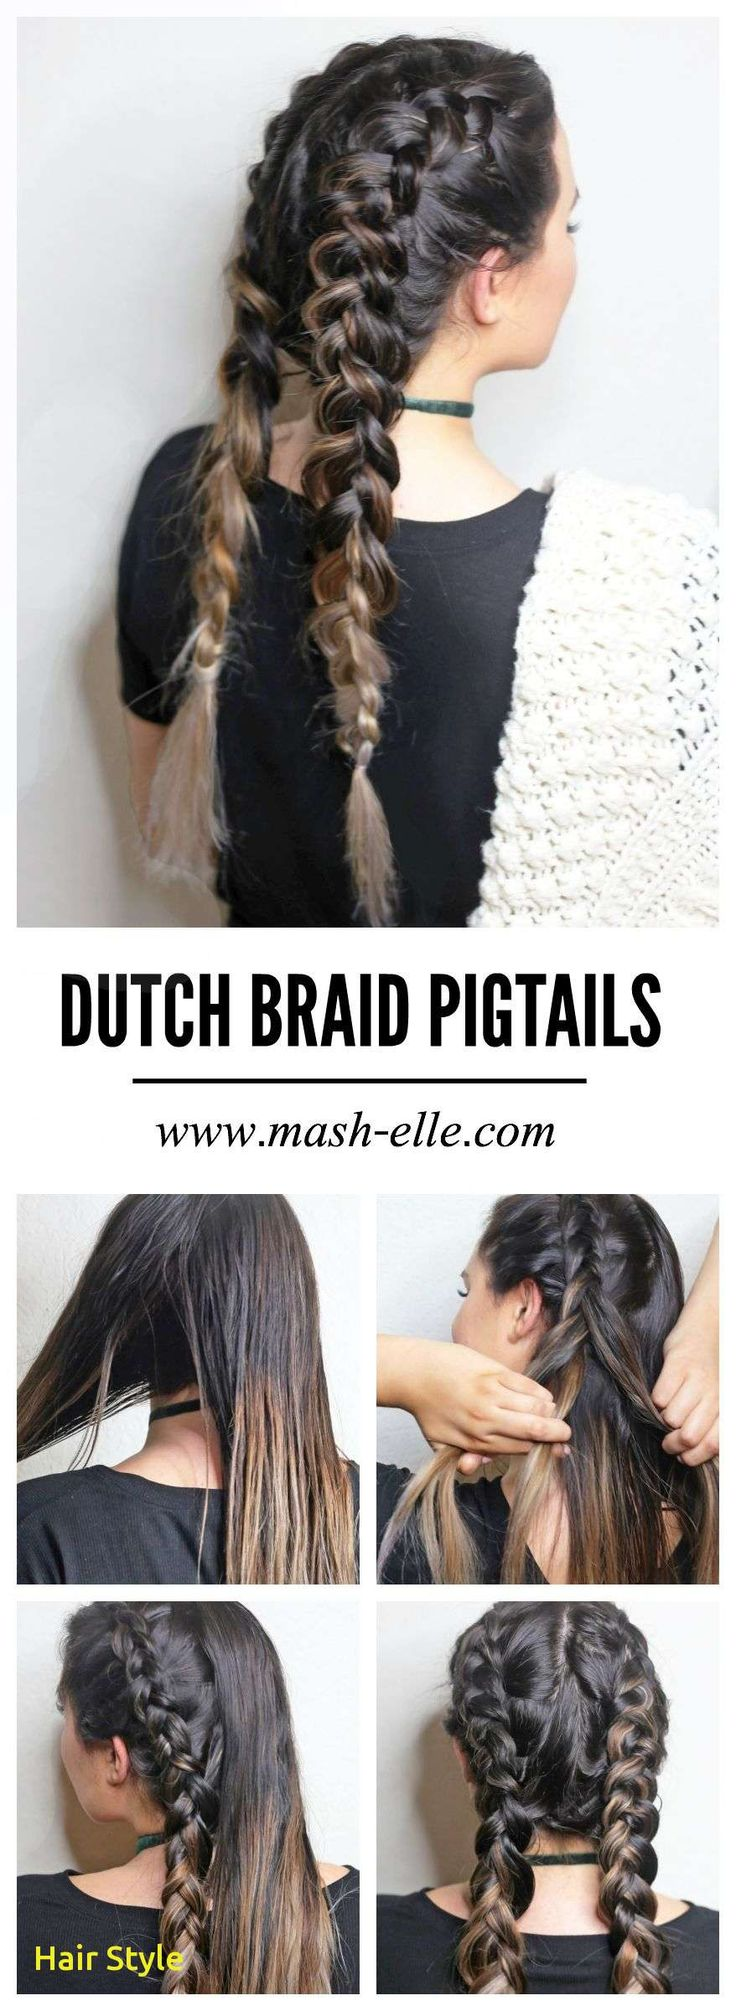 Unique simple braids